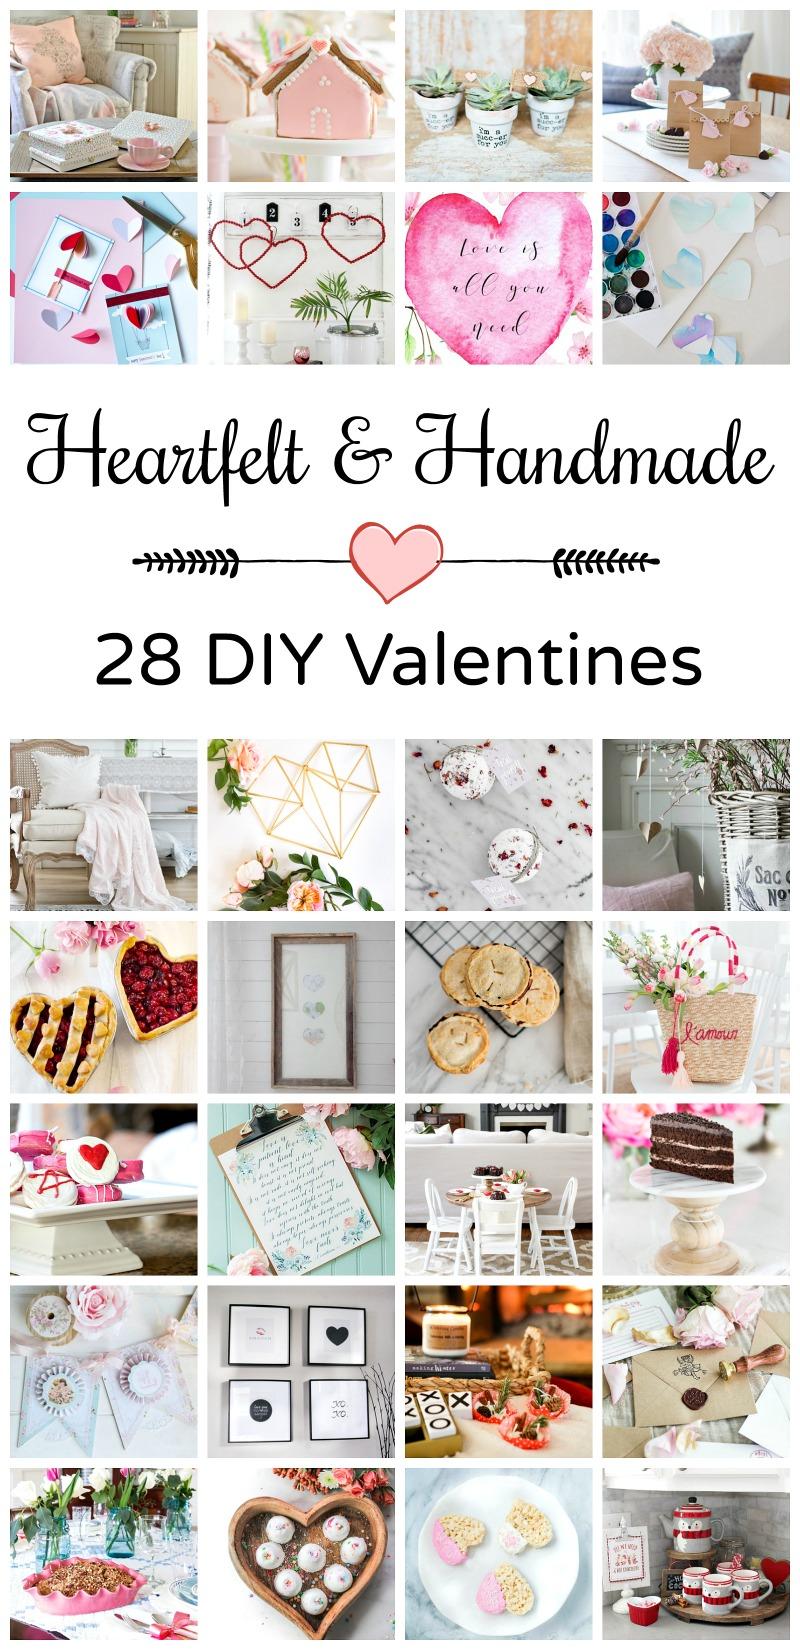 Heartfelt & Handmade 28 Valentines.